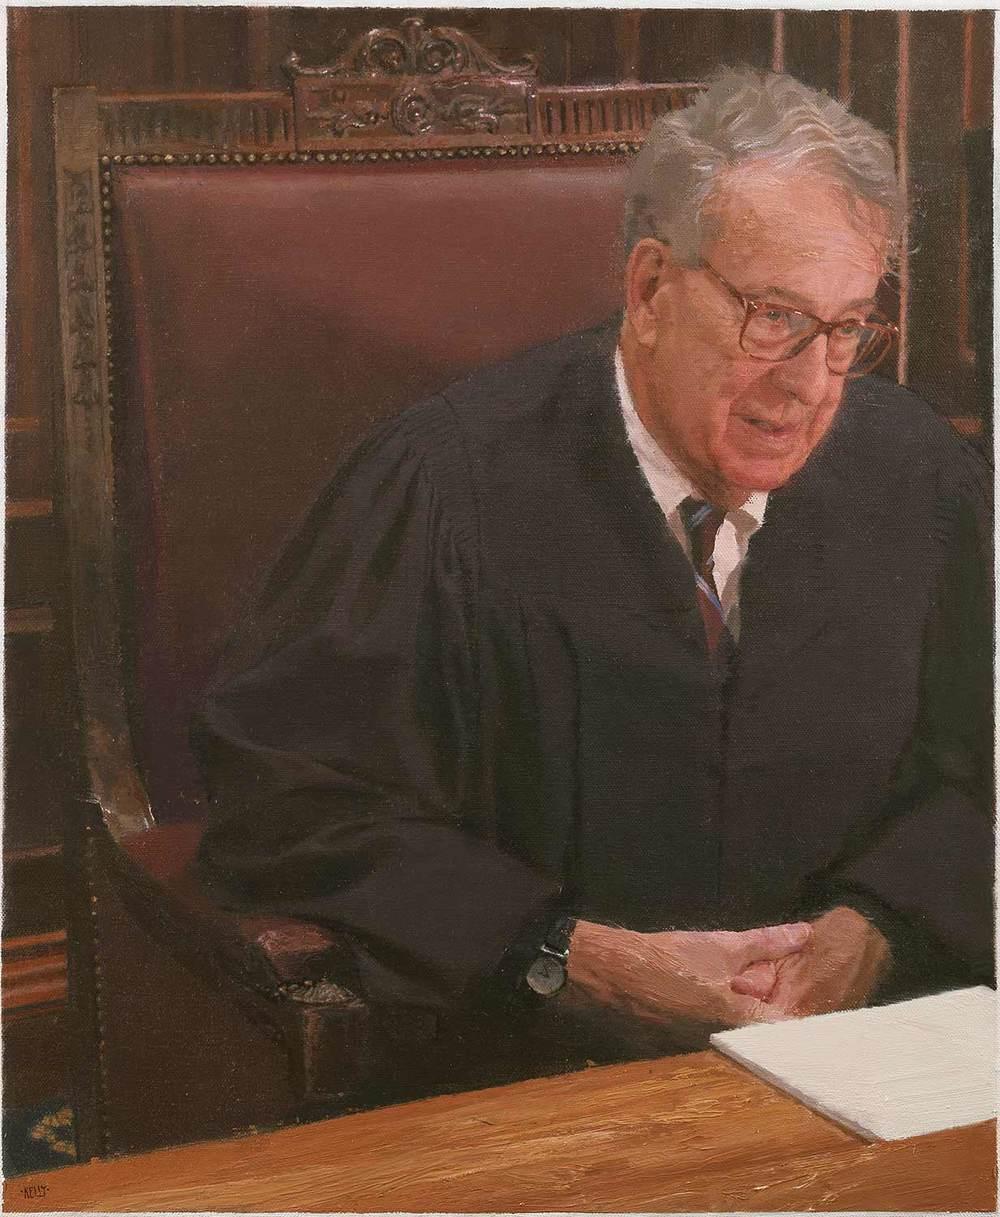 Judge Timothy Dyk